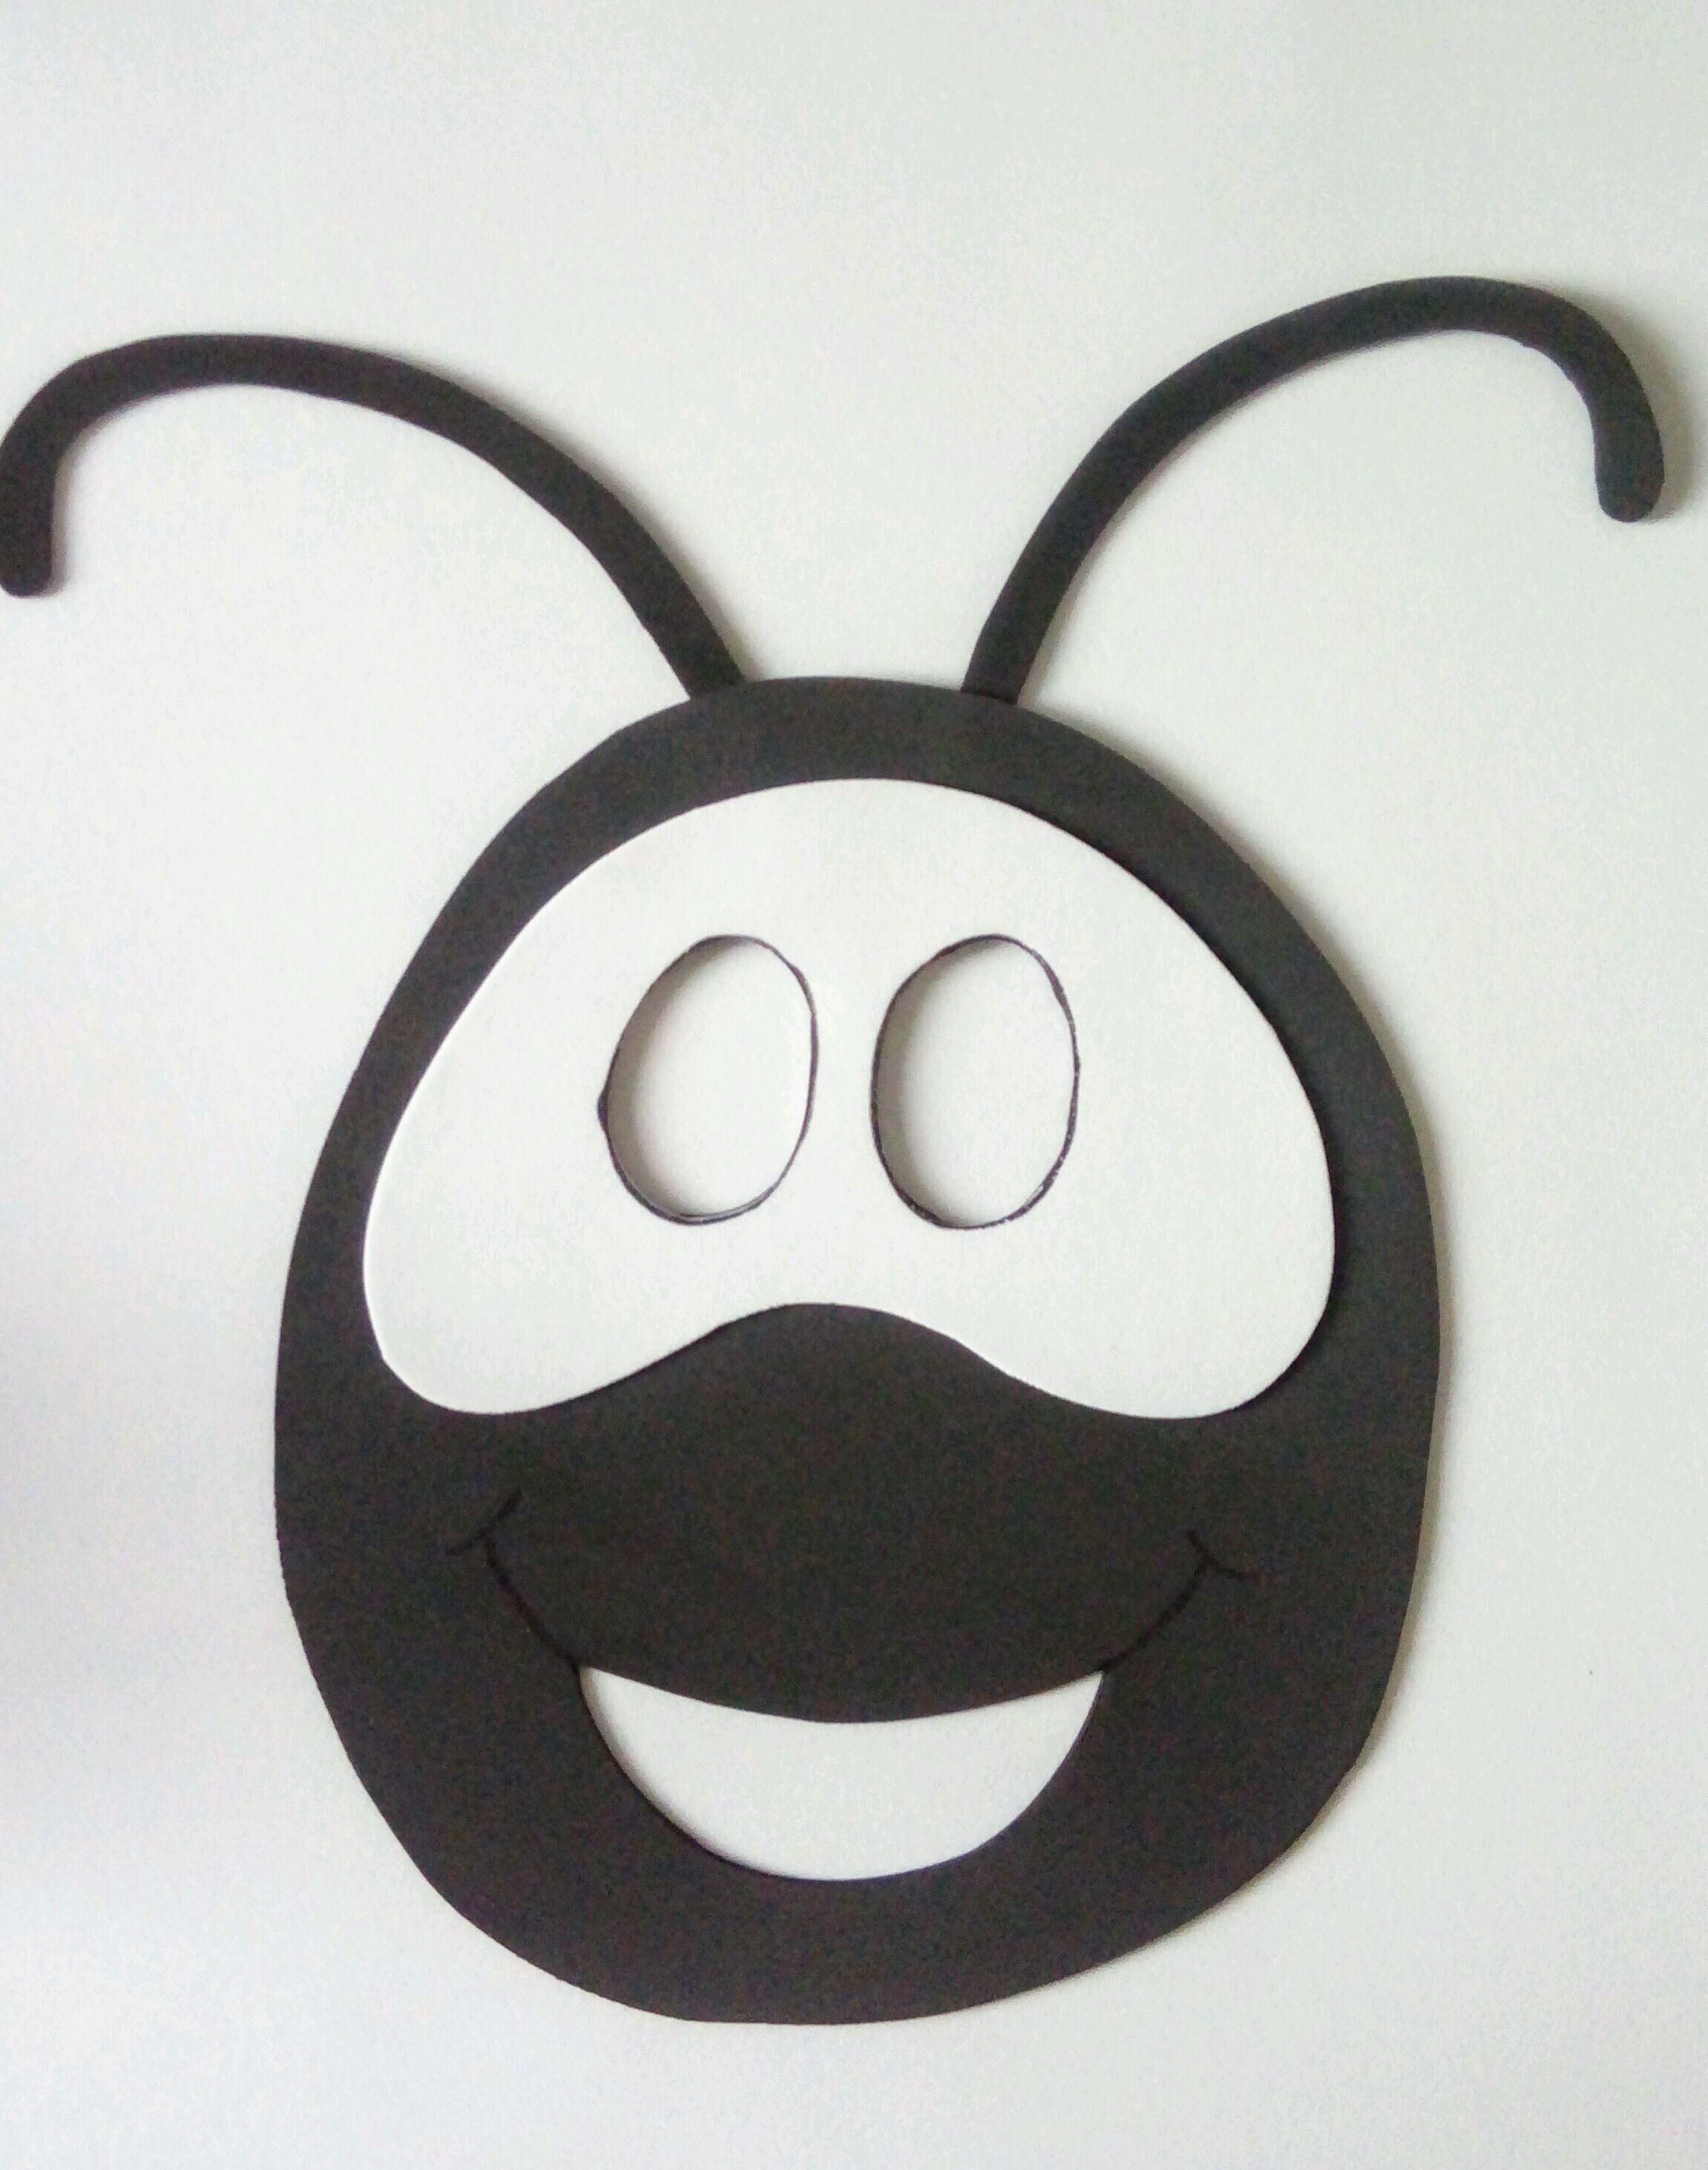 Formiga Smilinguido Mascara No Elo7 Joaninha Enfeites Aa02fa